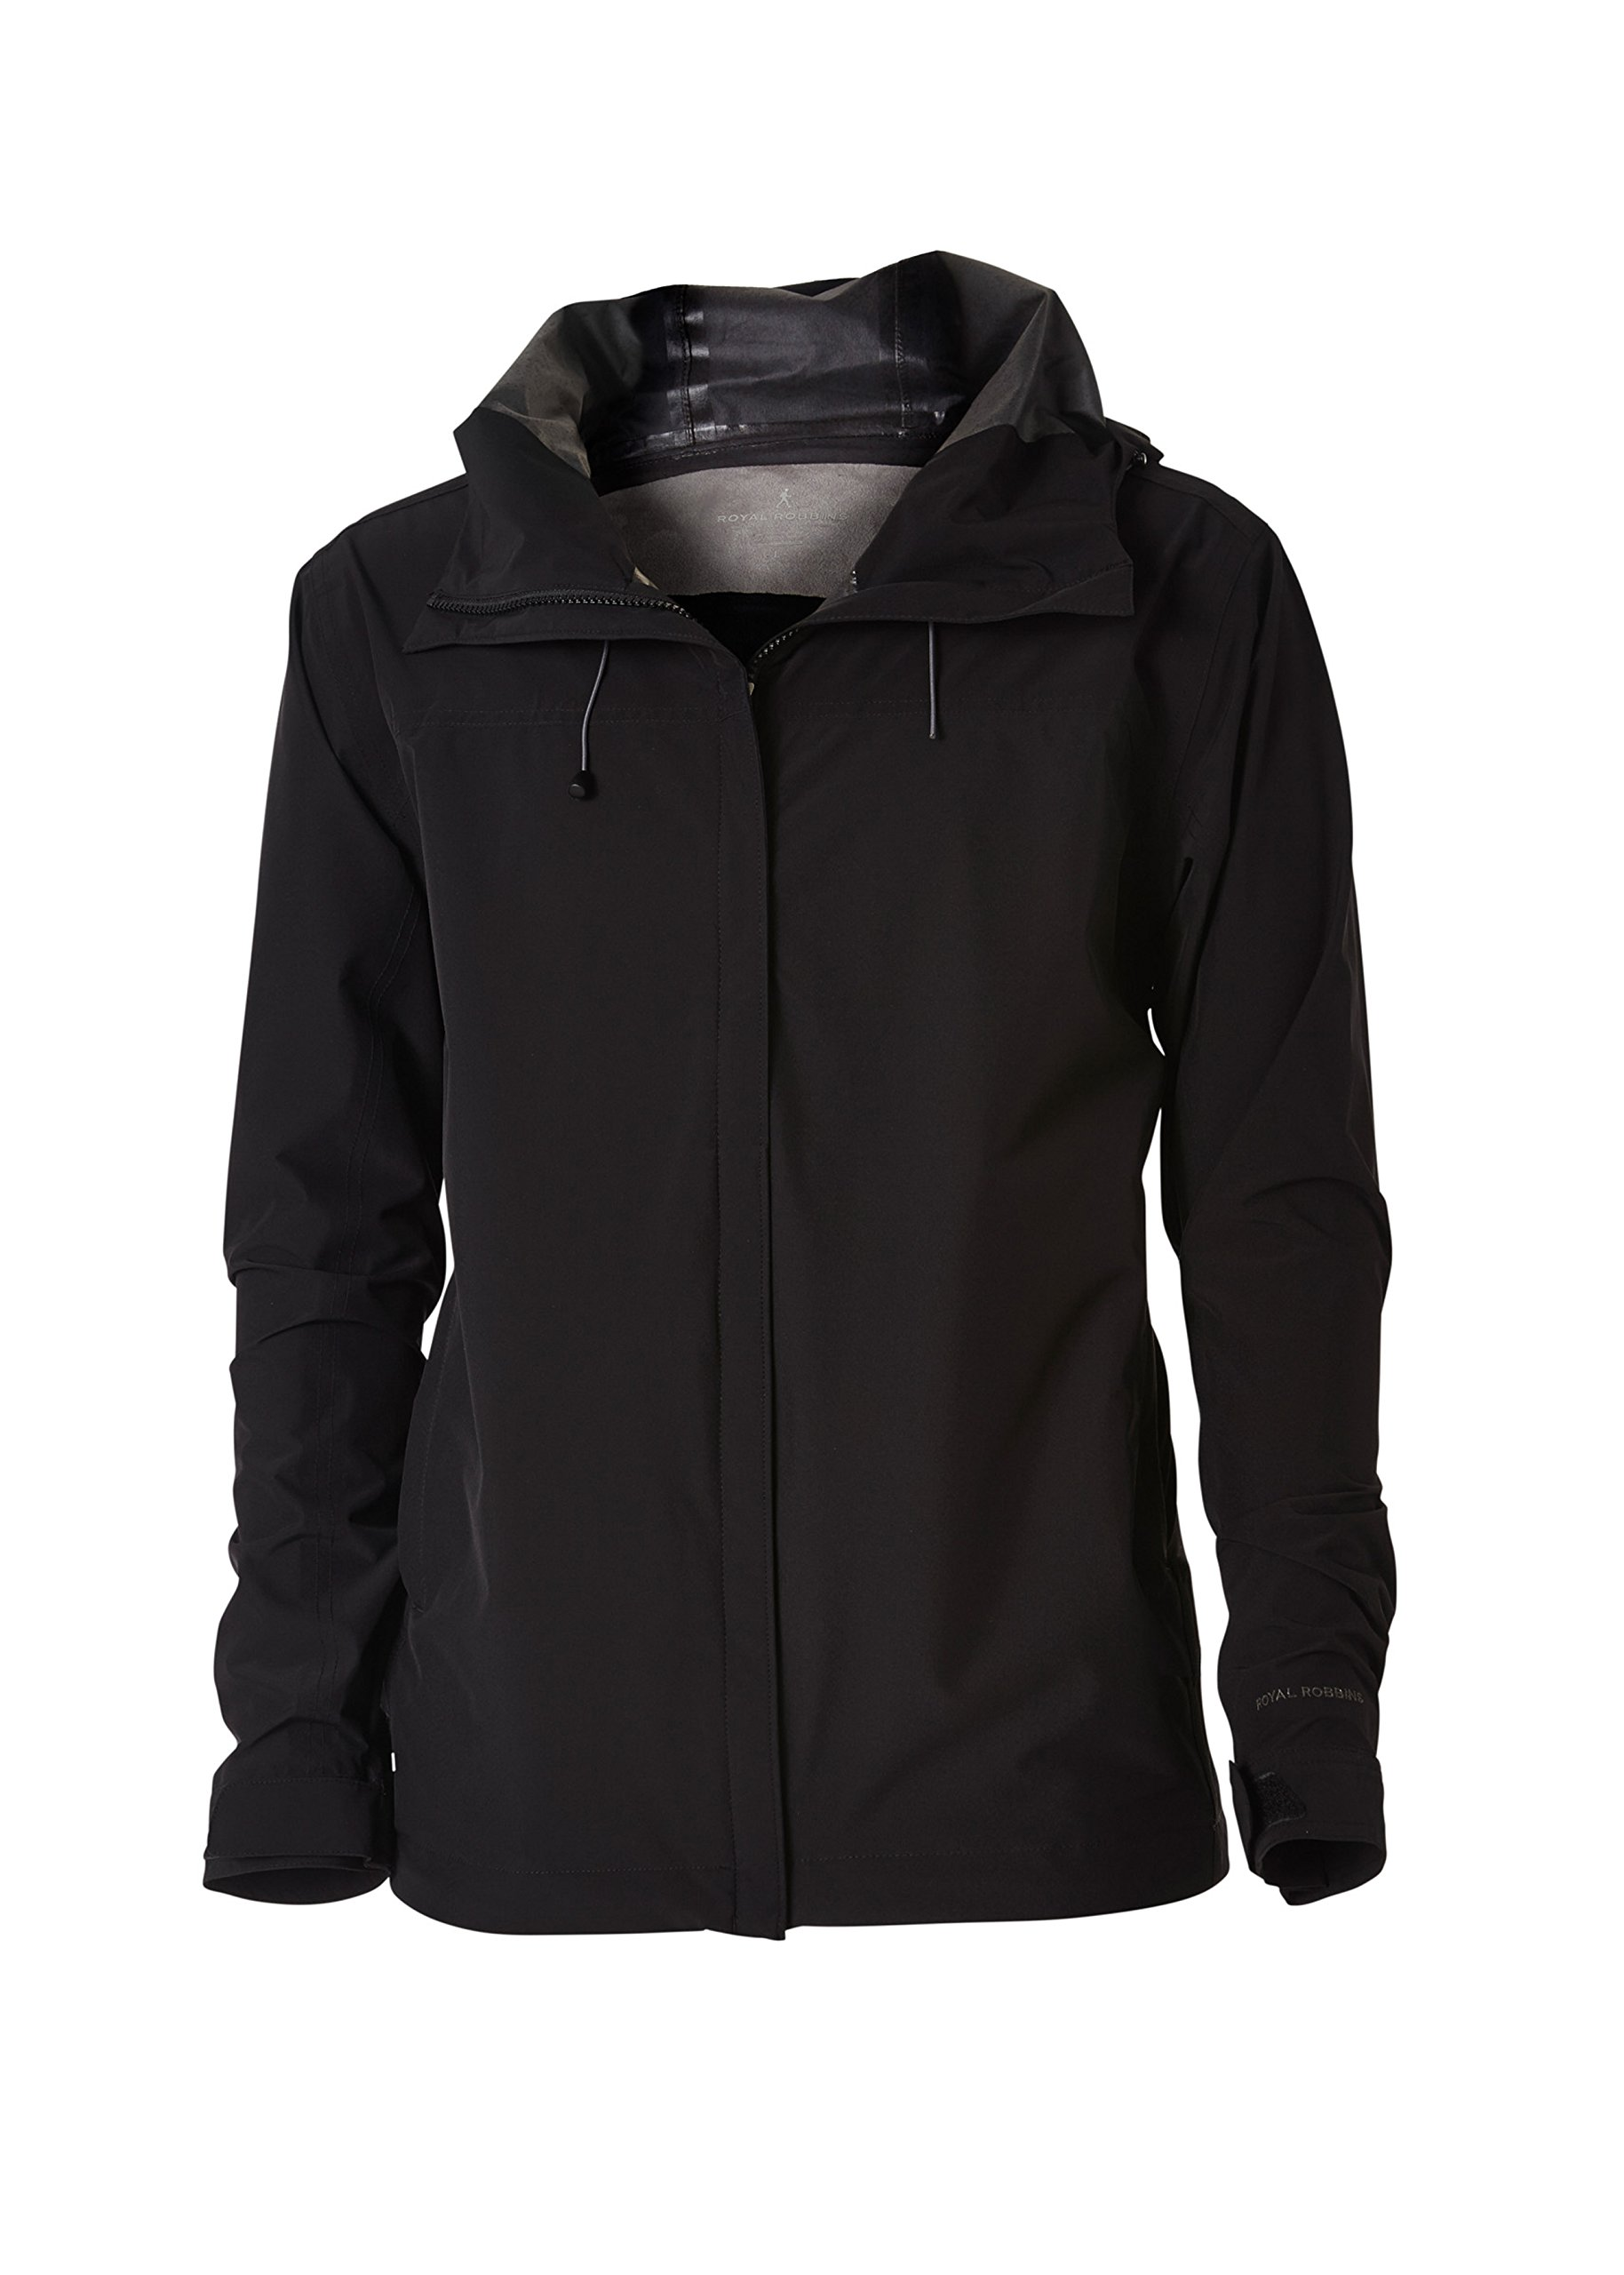 Royal Robbins Men's Oakham Waterproof Jacket, XX-Large, Jet Black